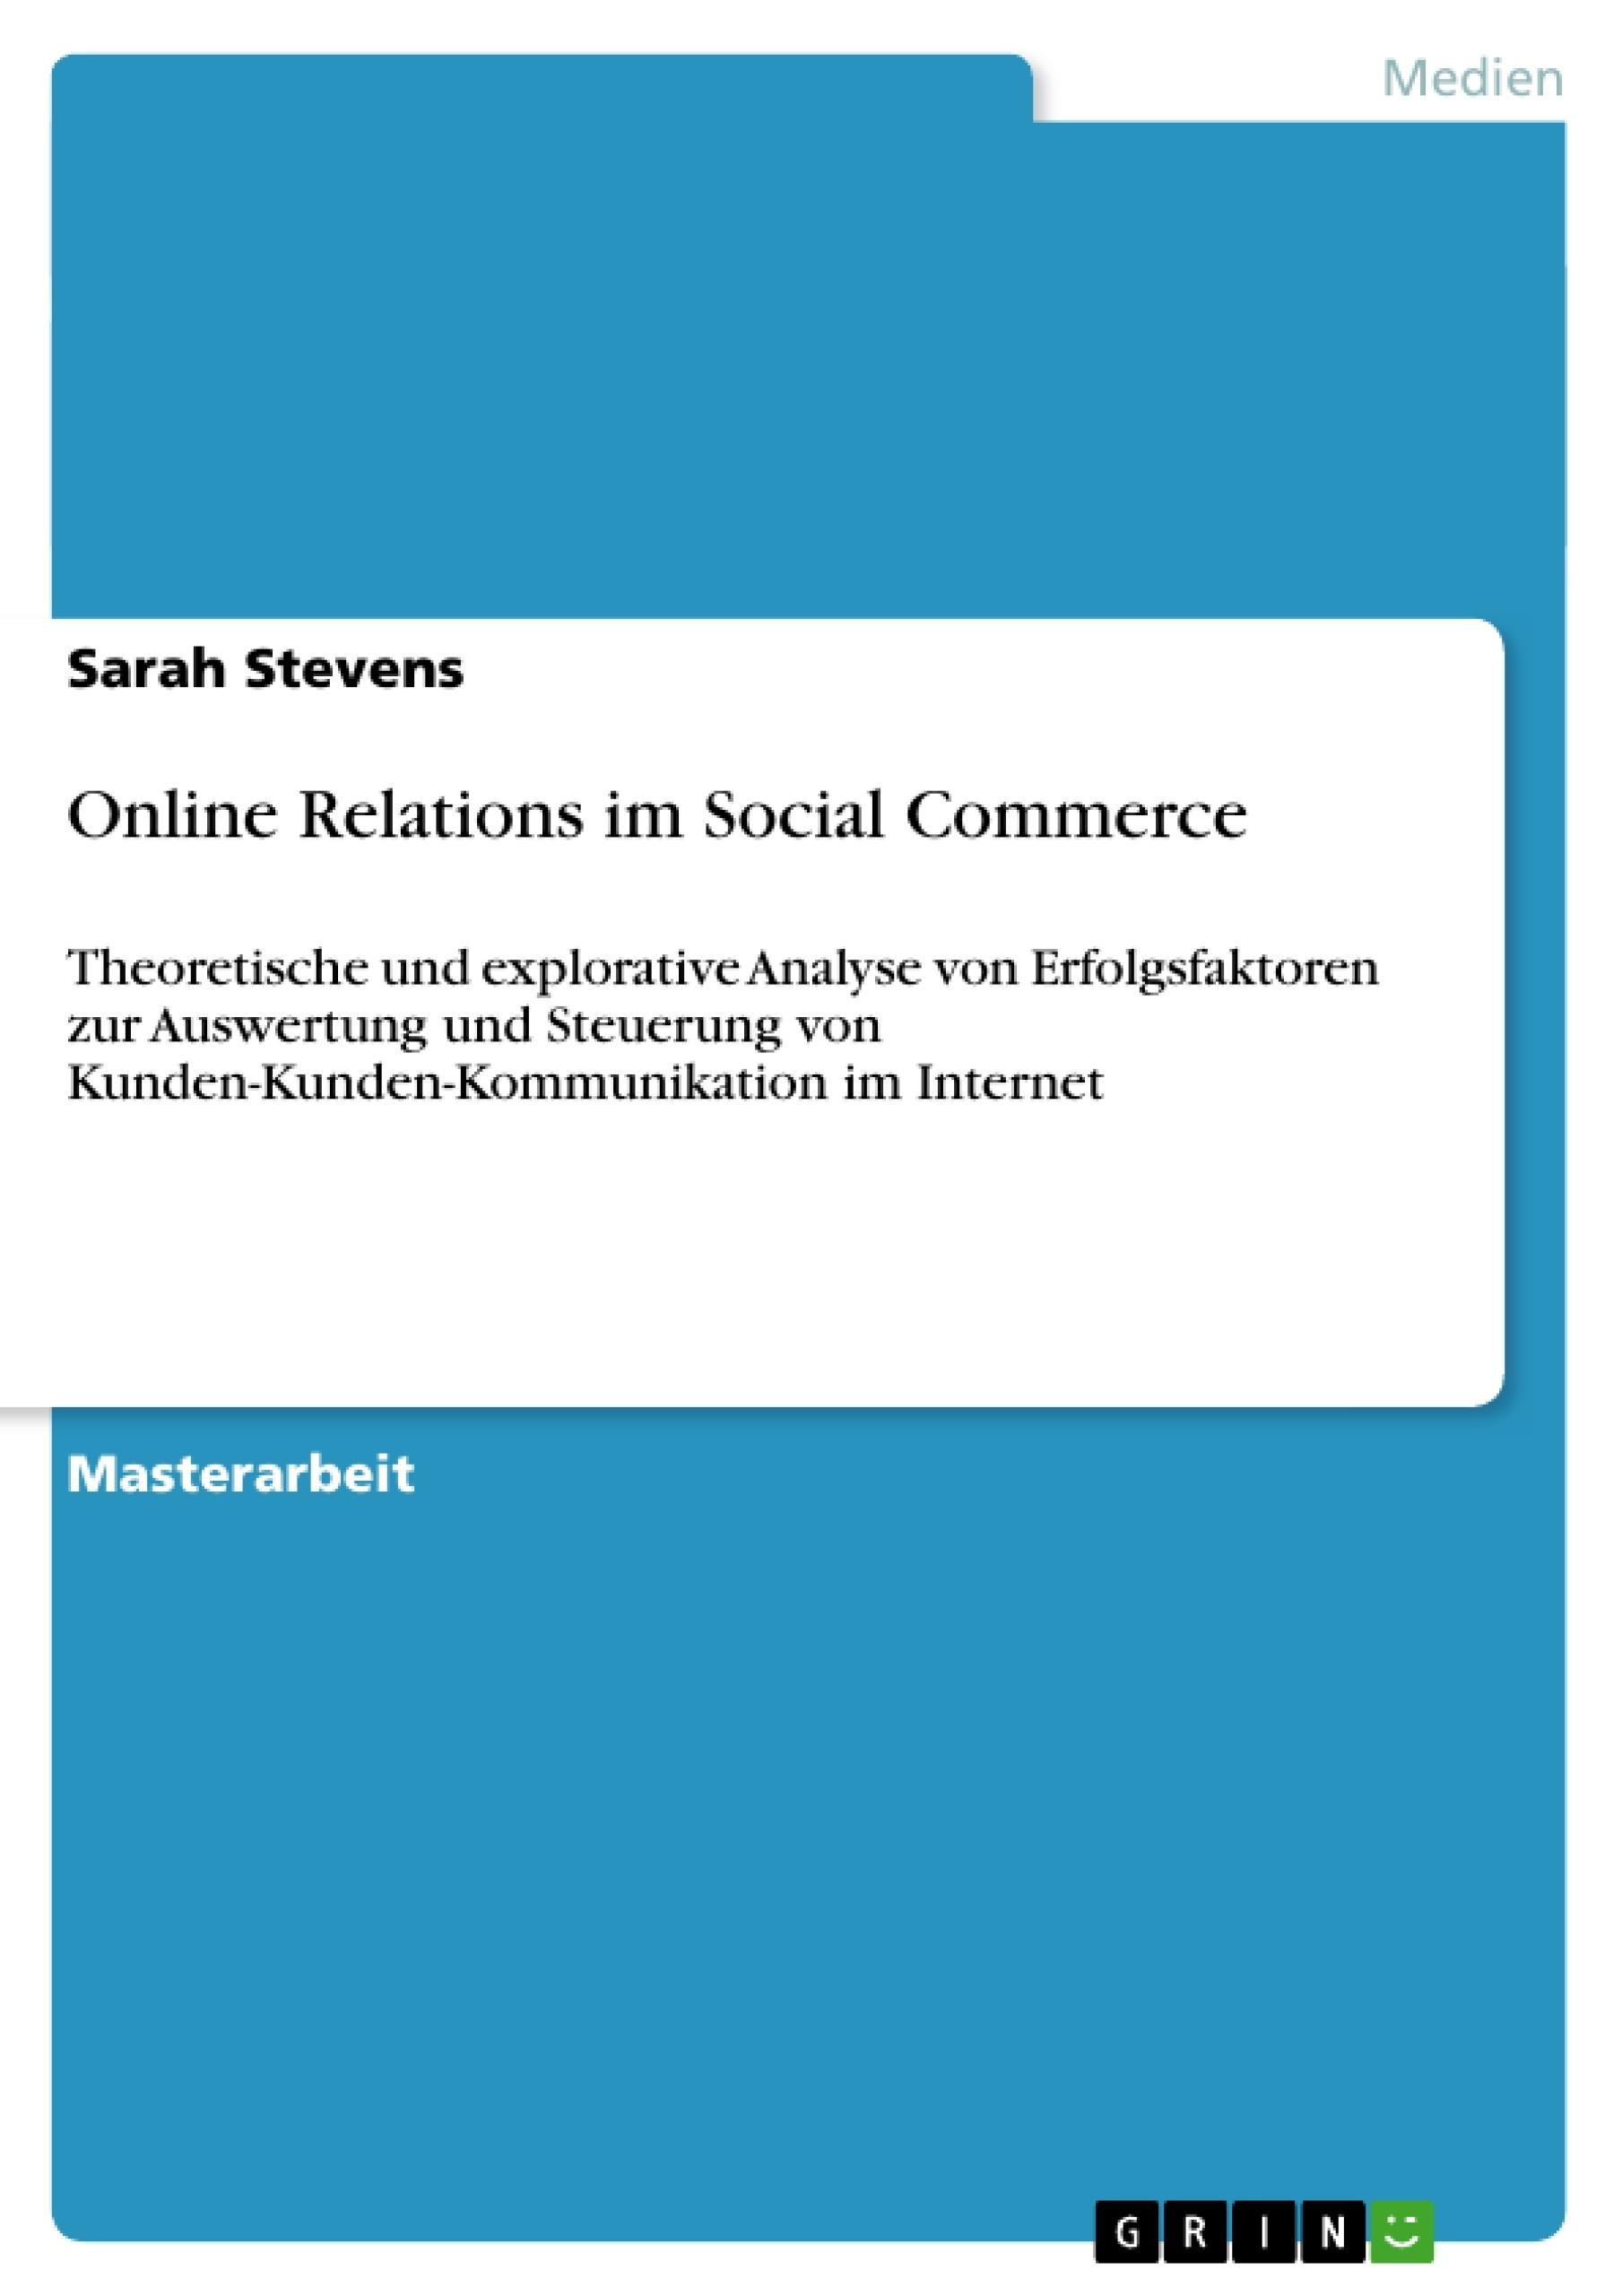 Titel: Online Relations im Social Commerce